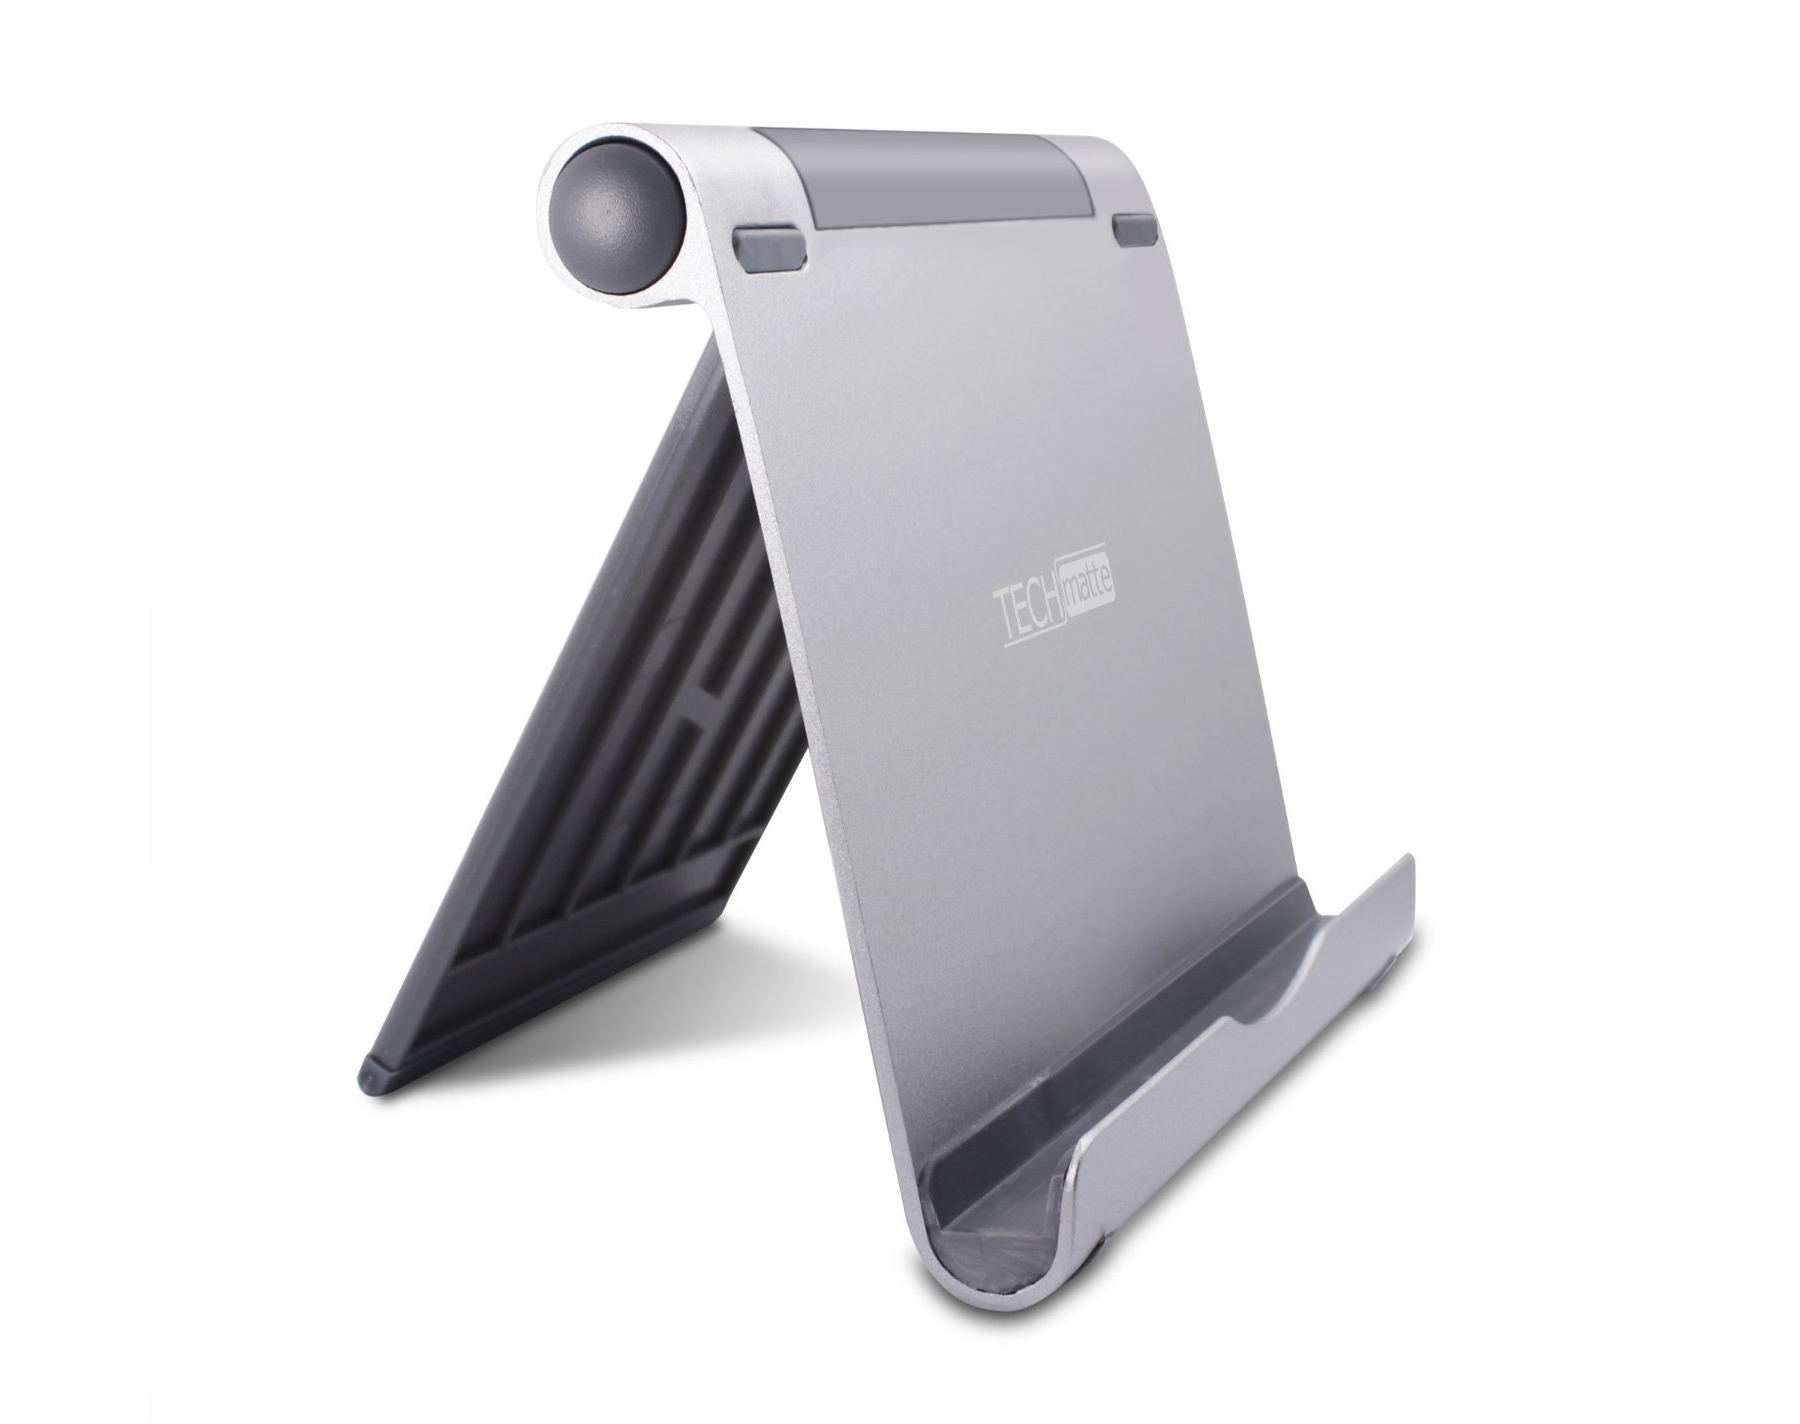 techmatte-mini-stand-xl-ipad-pro-angle-adjustable-desk-stand.jpg